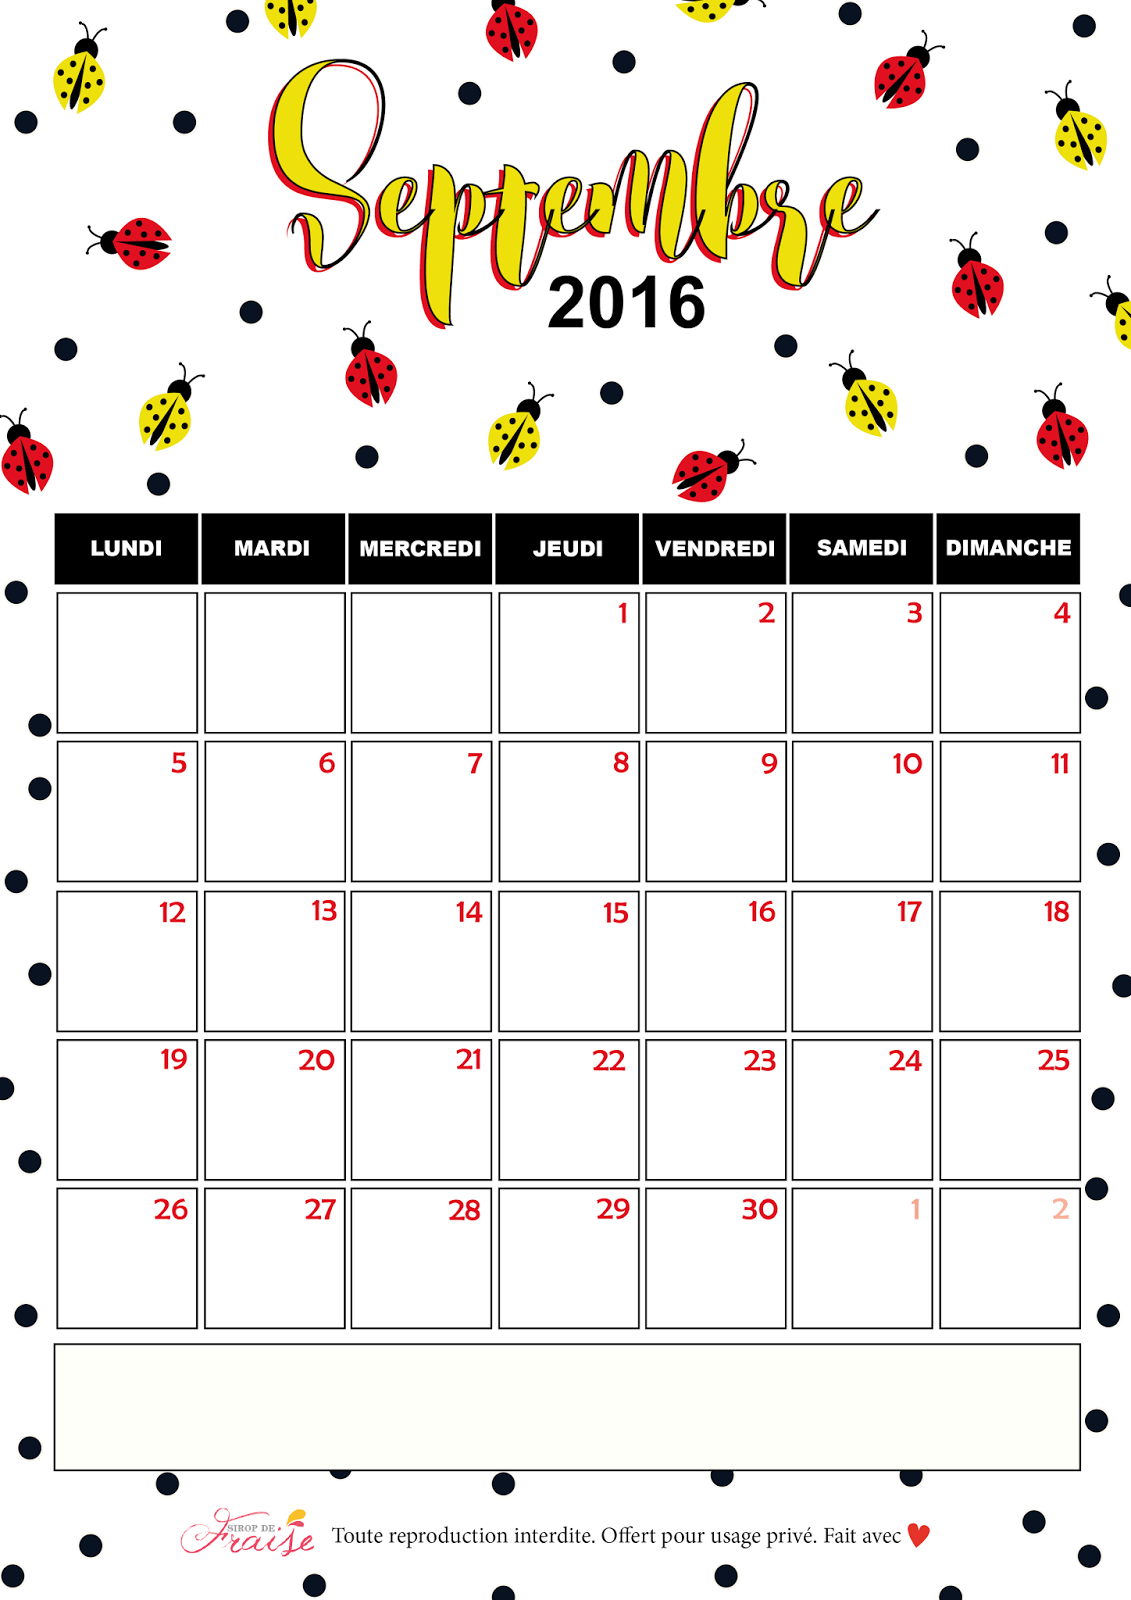 selection-Printable-Creamalice-calendriers-diy-septembre2016-1